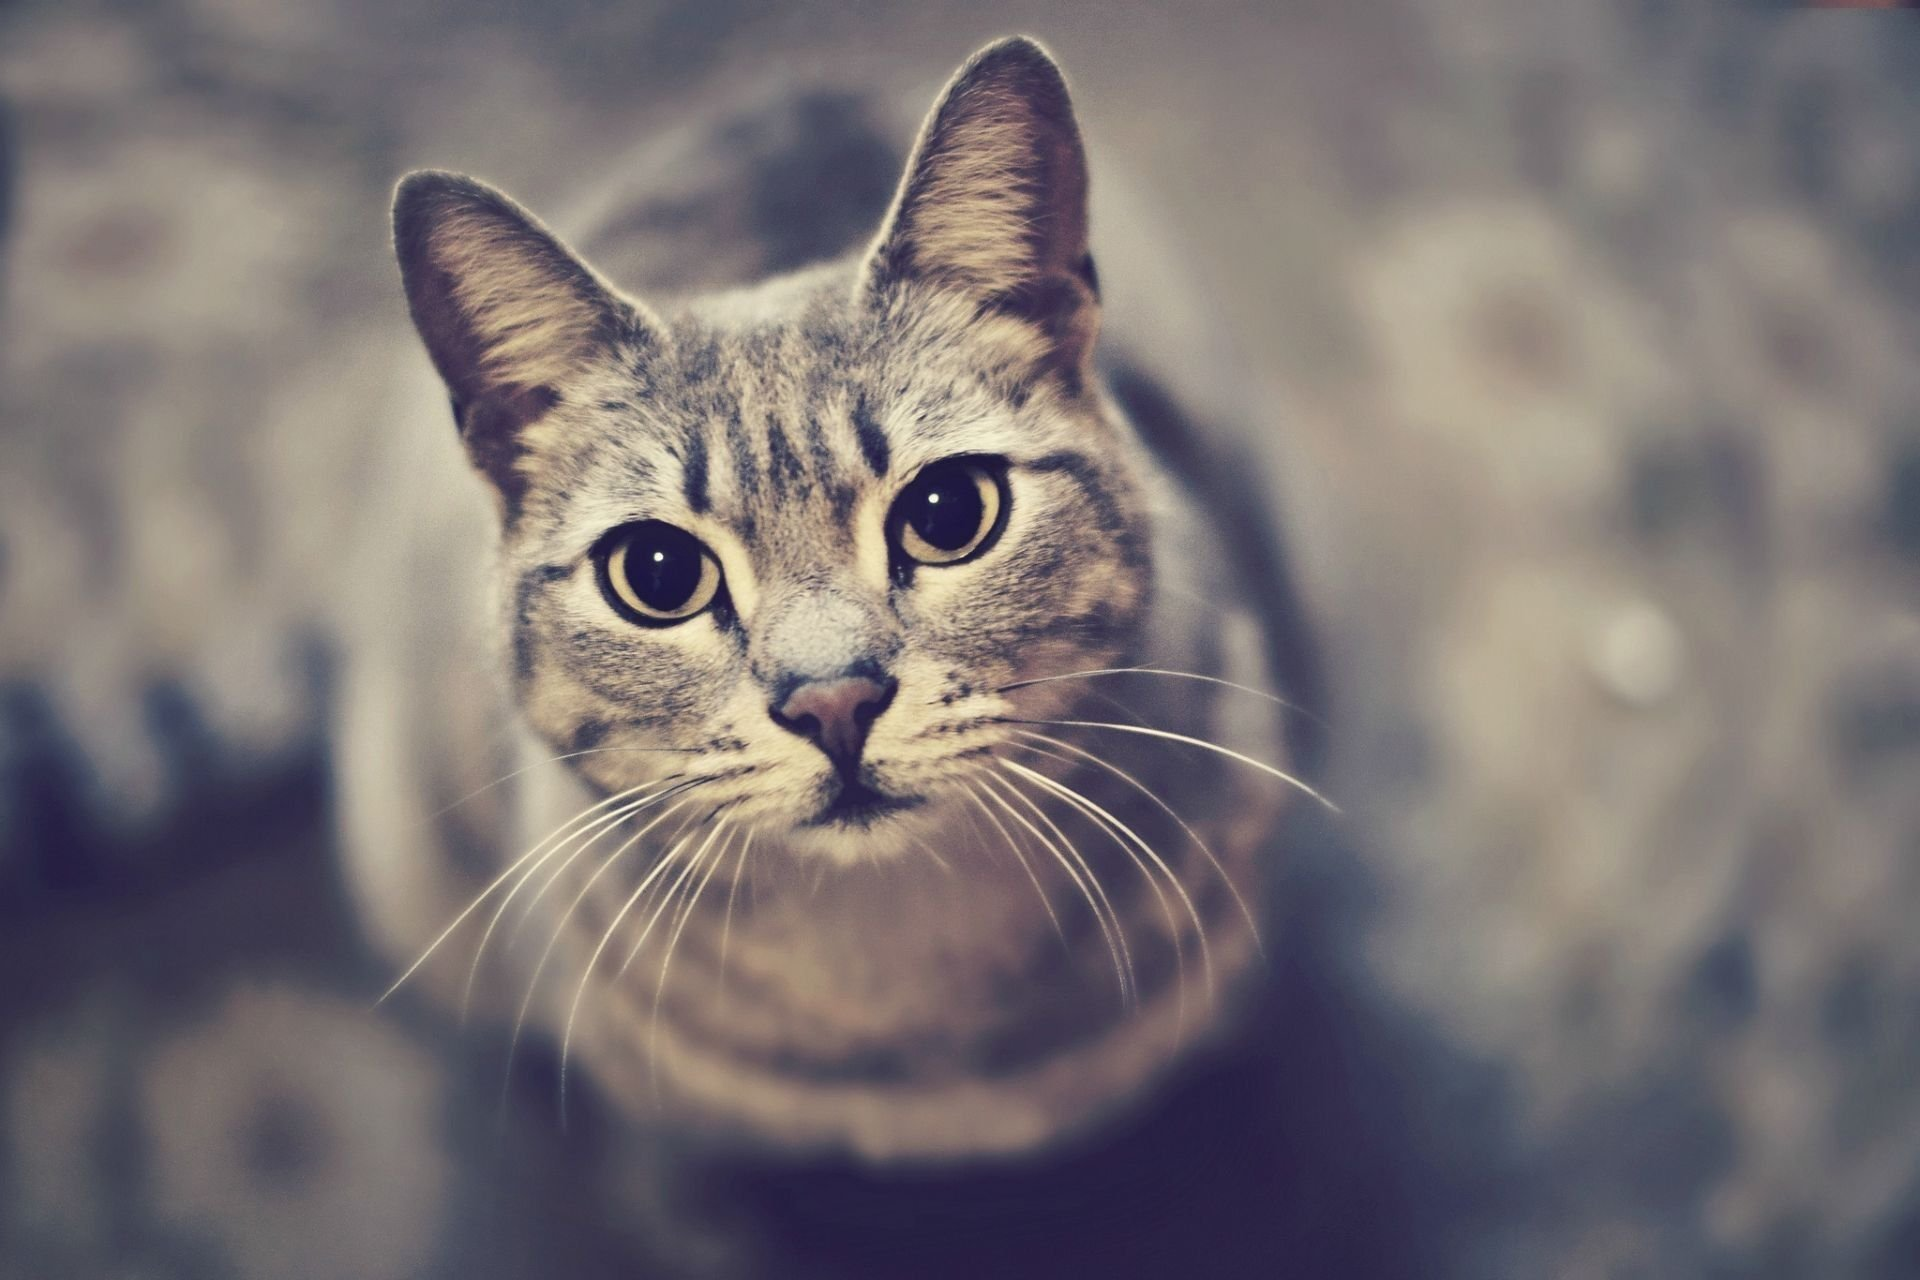 android安卓萌宠 喵星人 可爱 宠物 卖萌 猫高清手机